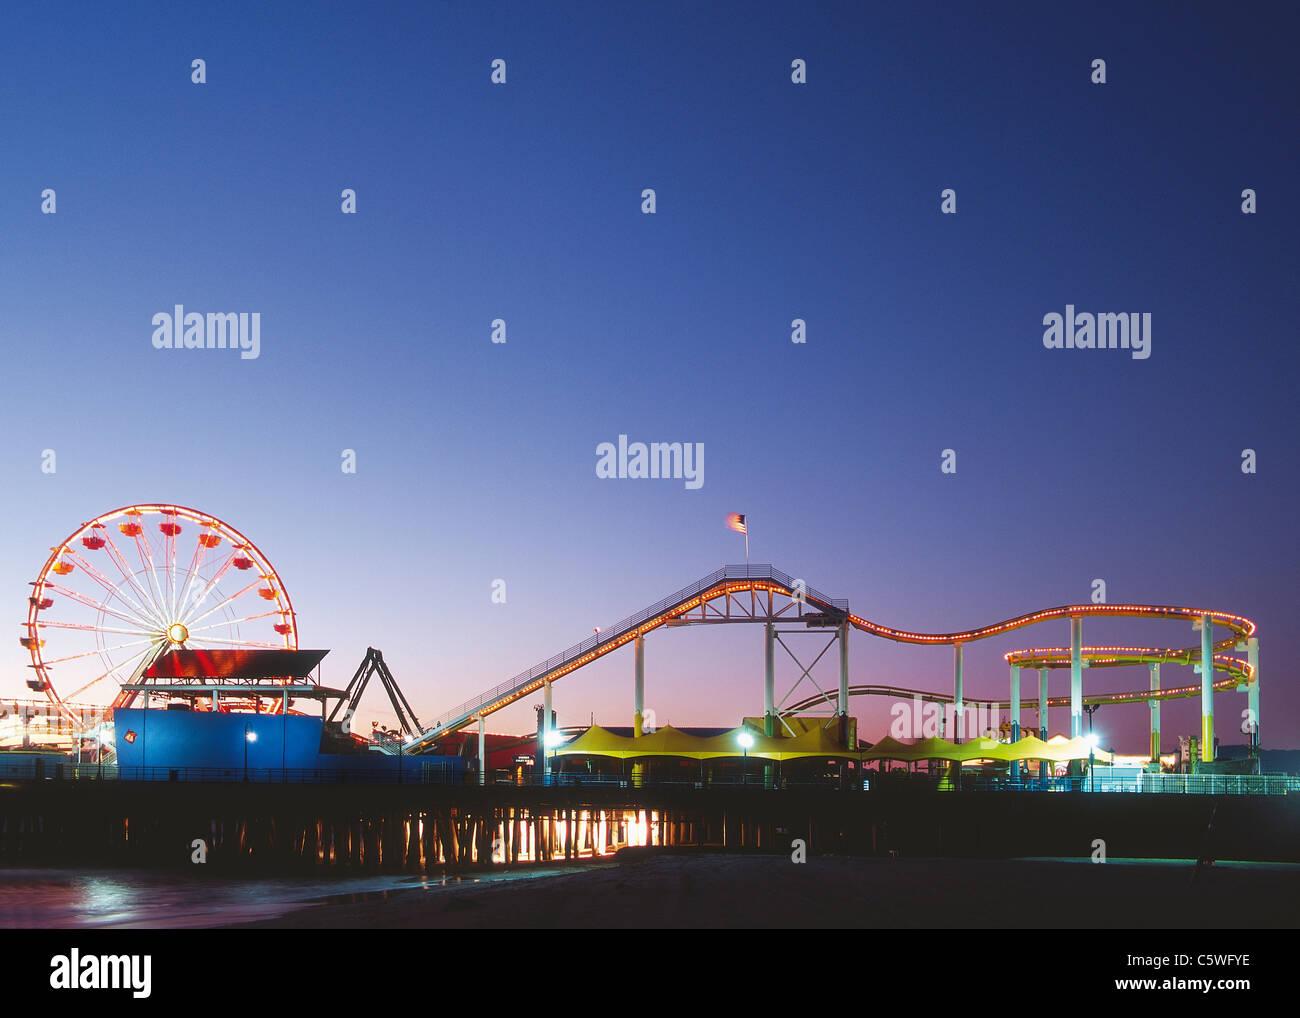 USA, California, Los Angeles, Blick auf den Vergnügungspark am Strand am Abend Stockbild